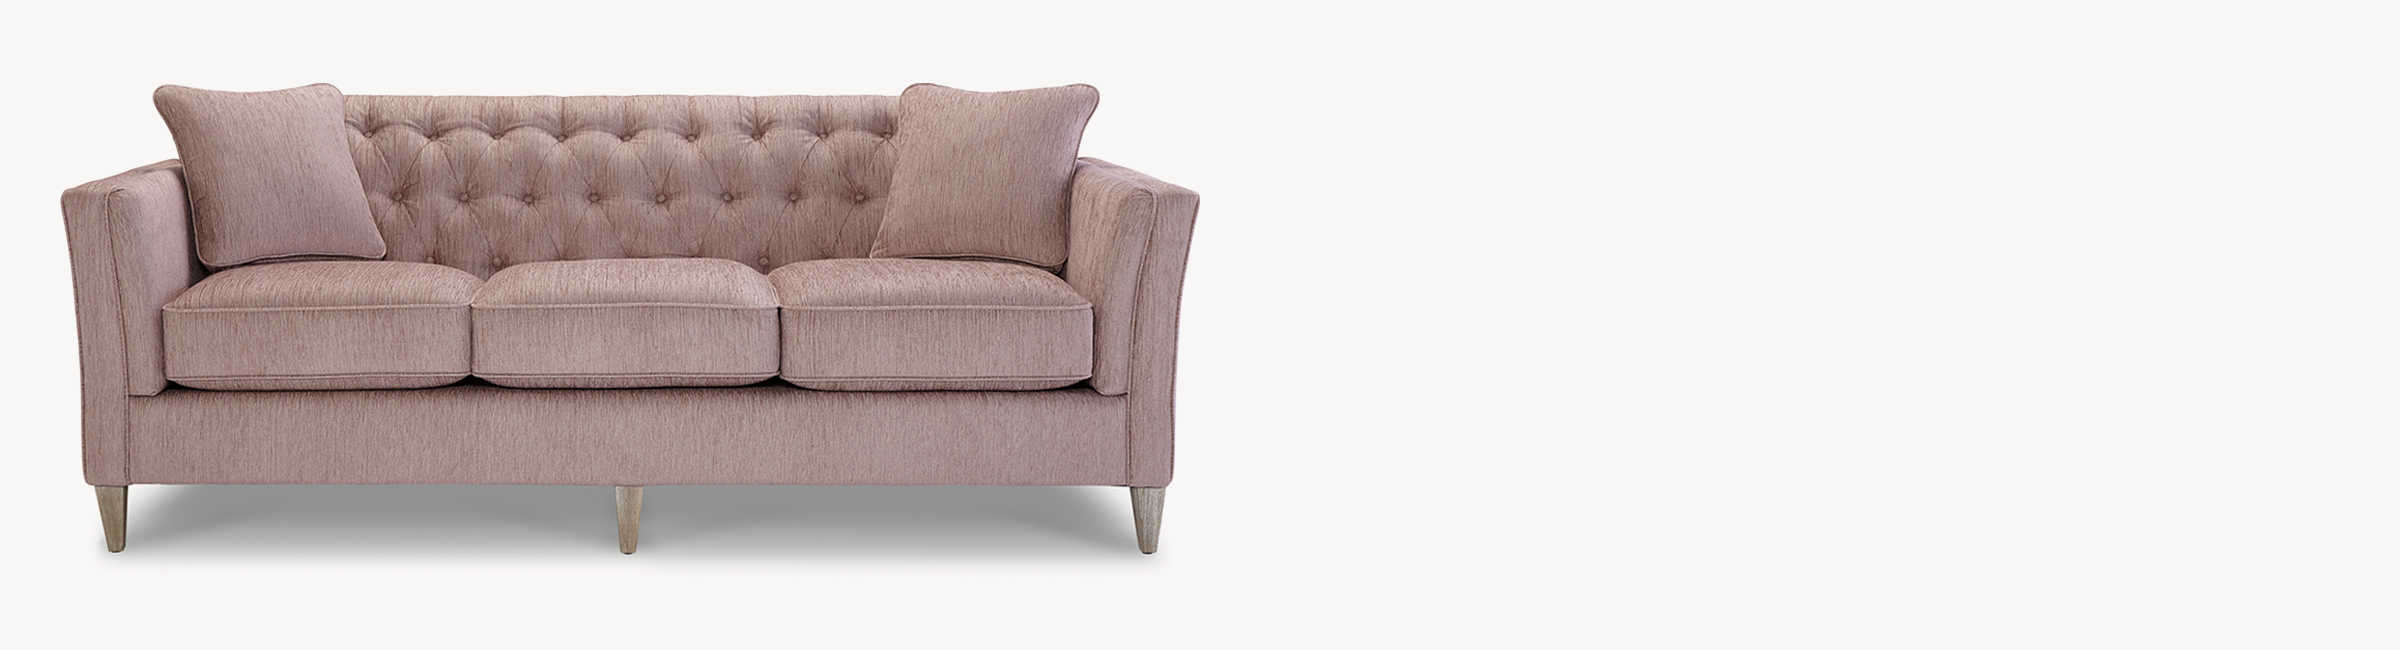 Sofa Sets & Couch Sets  La-Z-Boy